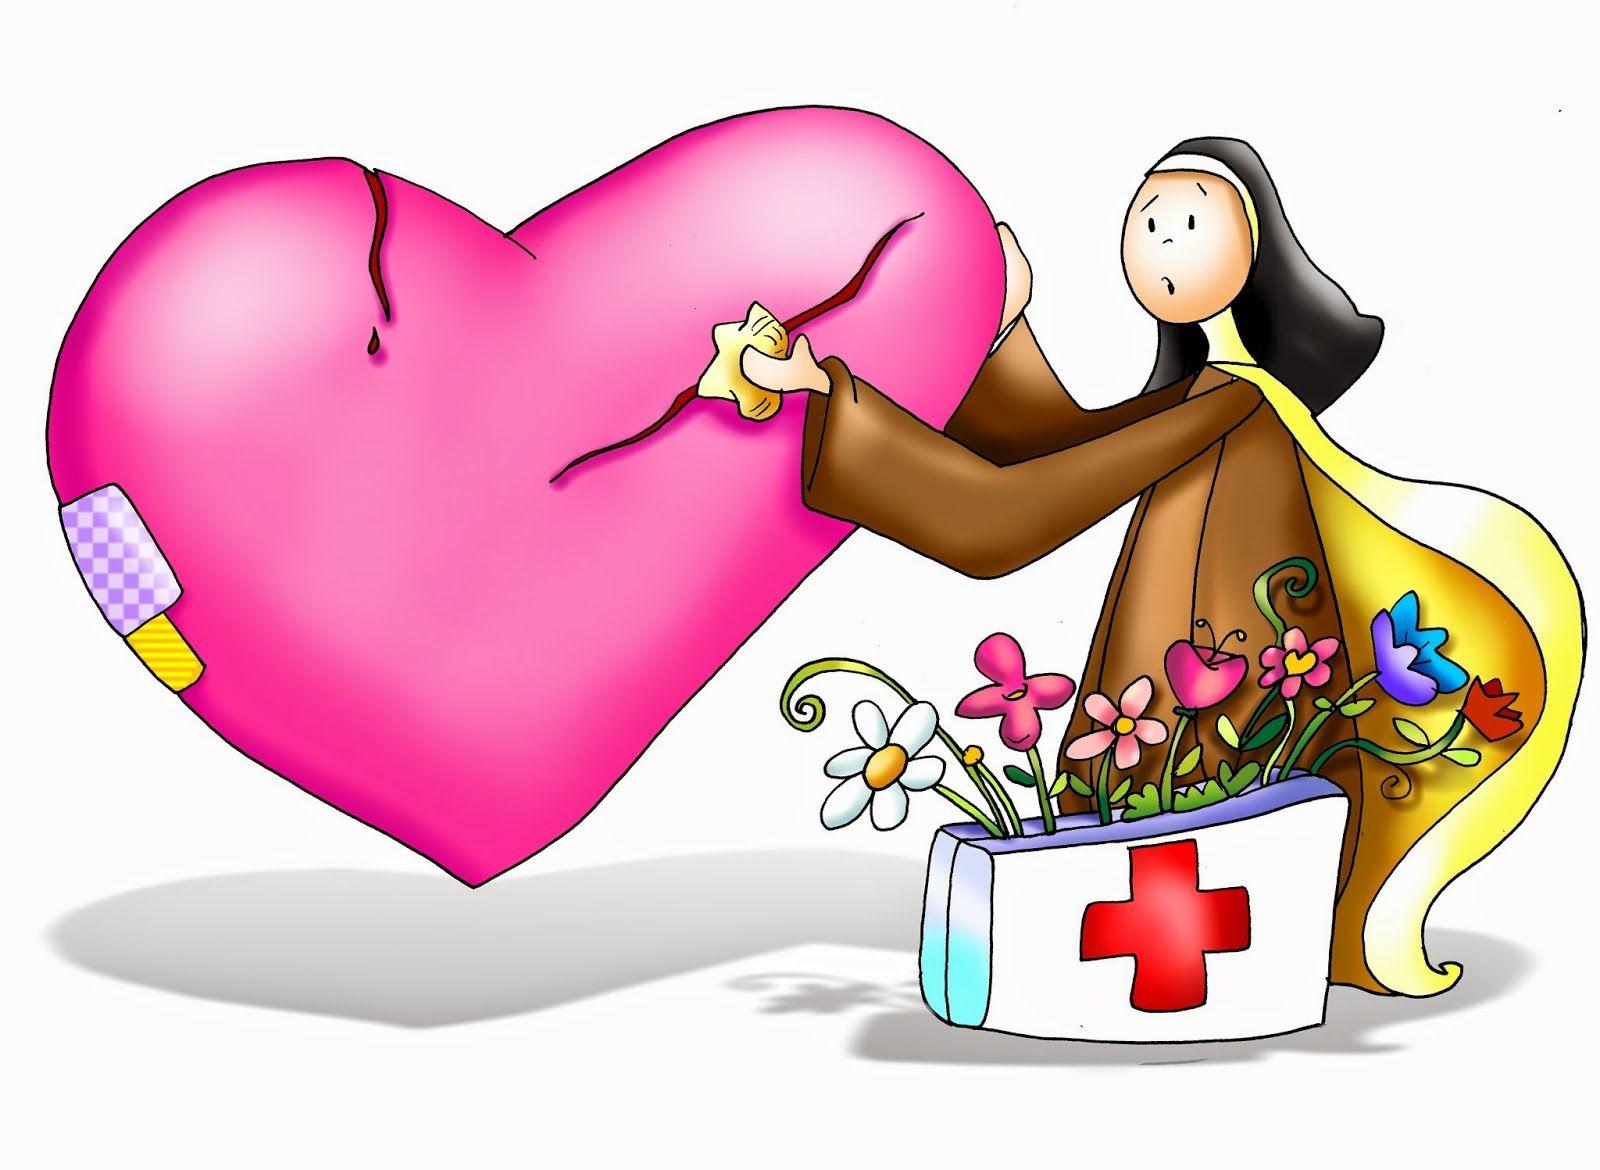 Santa Teresa, arreglando el corazón roto   Fano   Pinterest   Santa ...